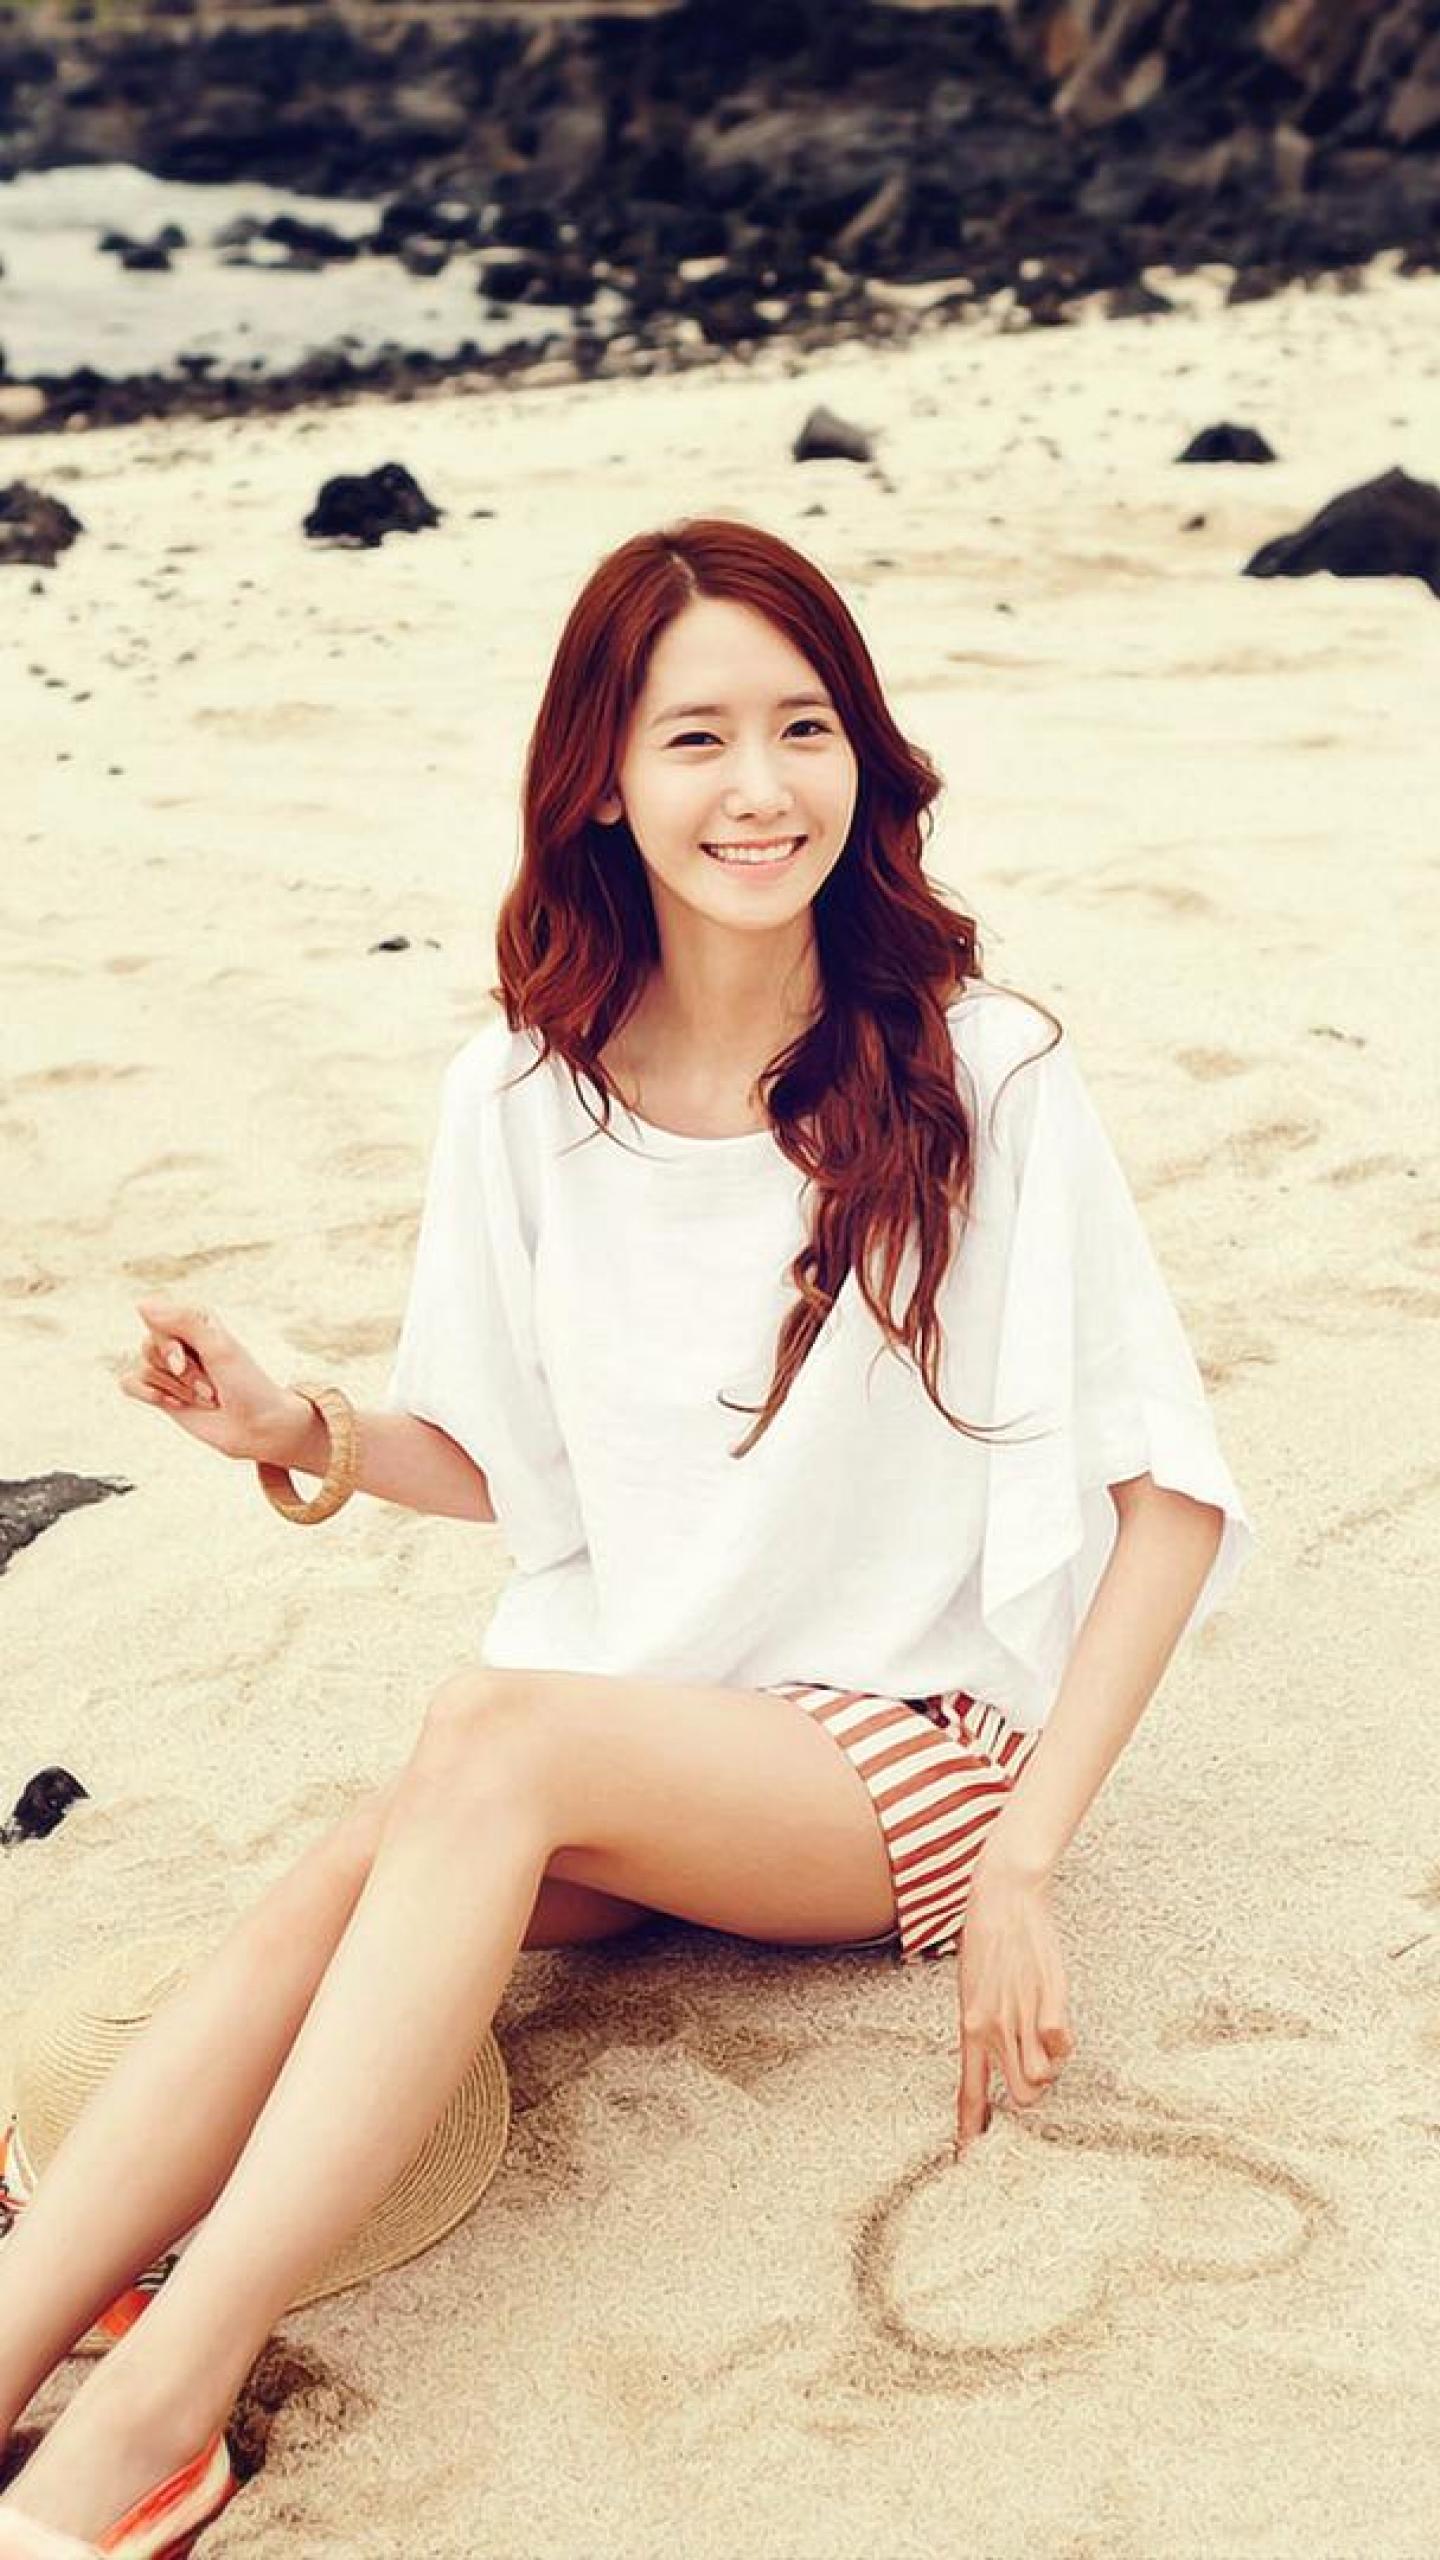 29-291030_snsd-girls-generation-kpop-kor